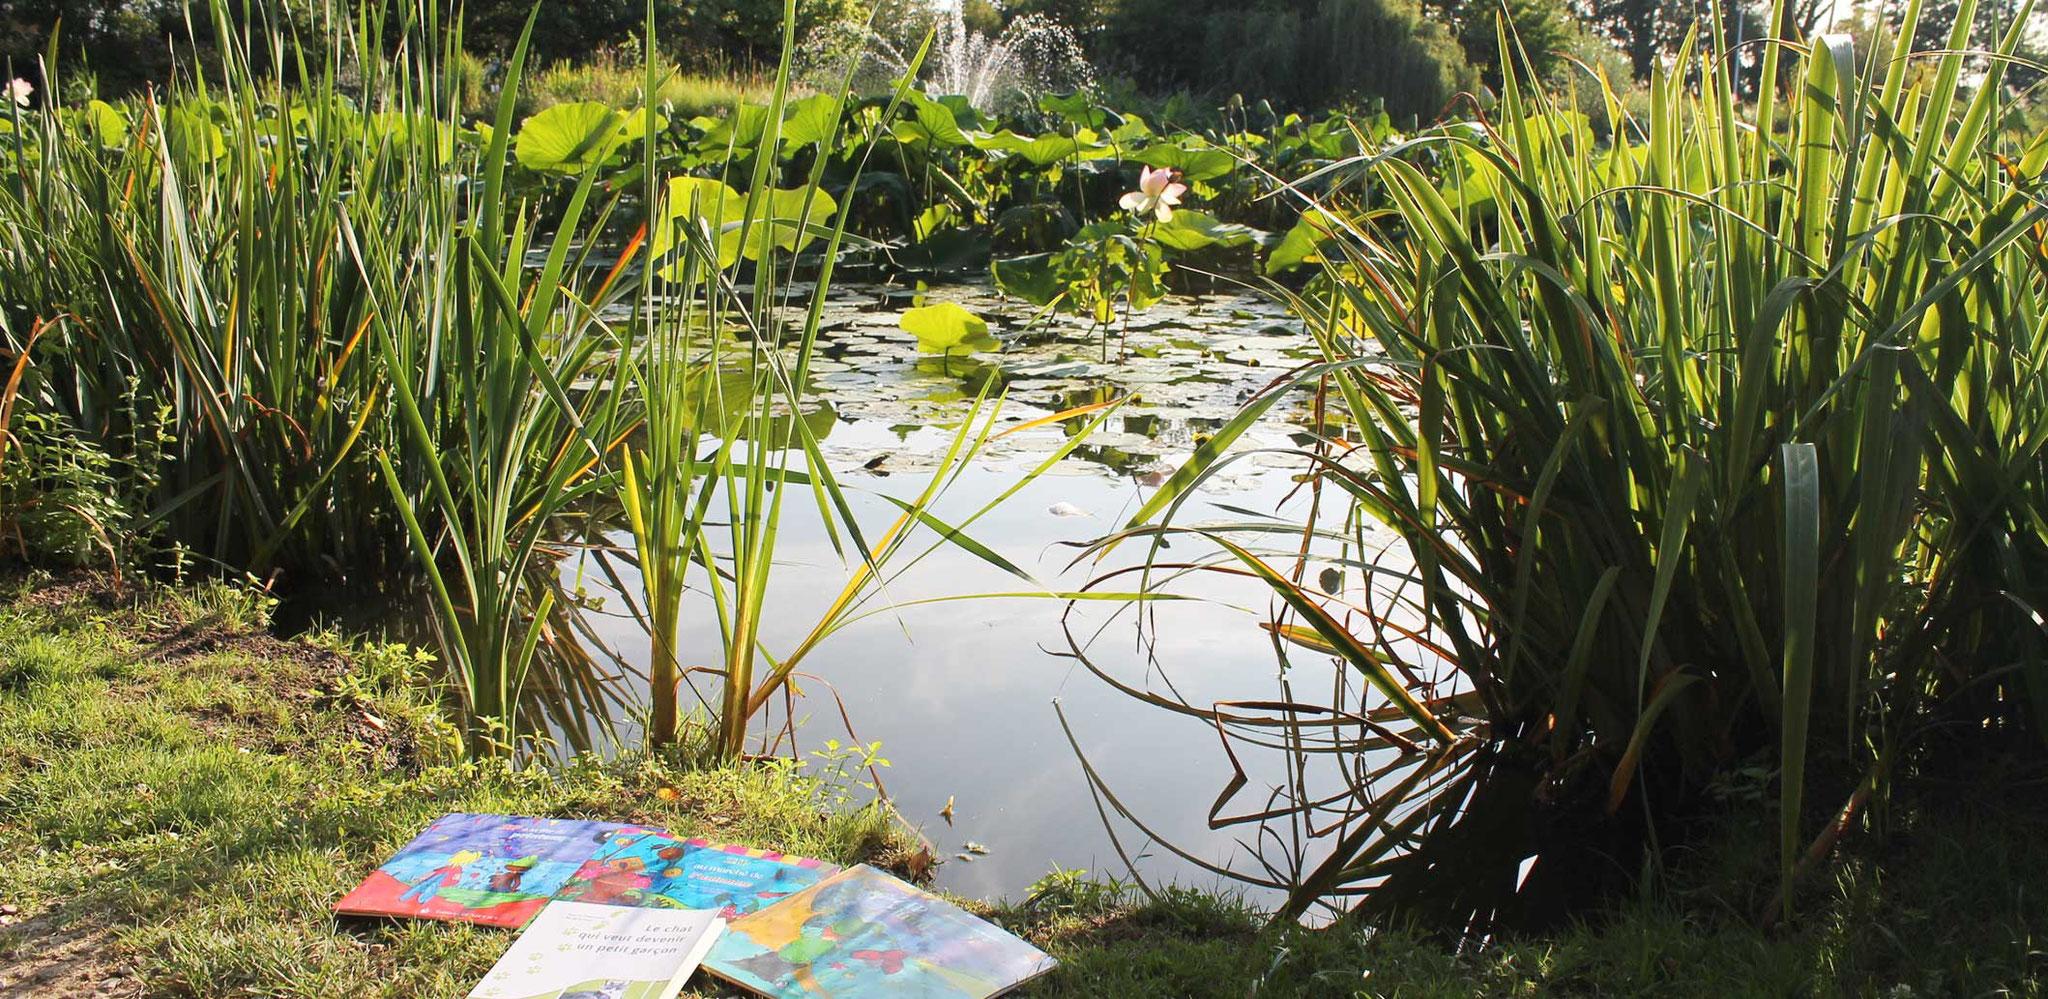 Les livres de Cloé Perrotin Benjulice Edition aux Jardins Aquatiques à l'été 2017